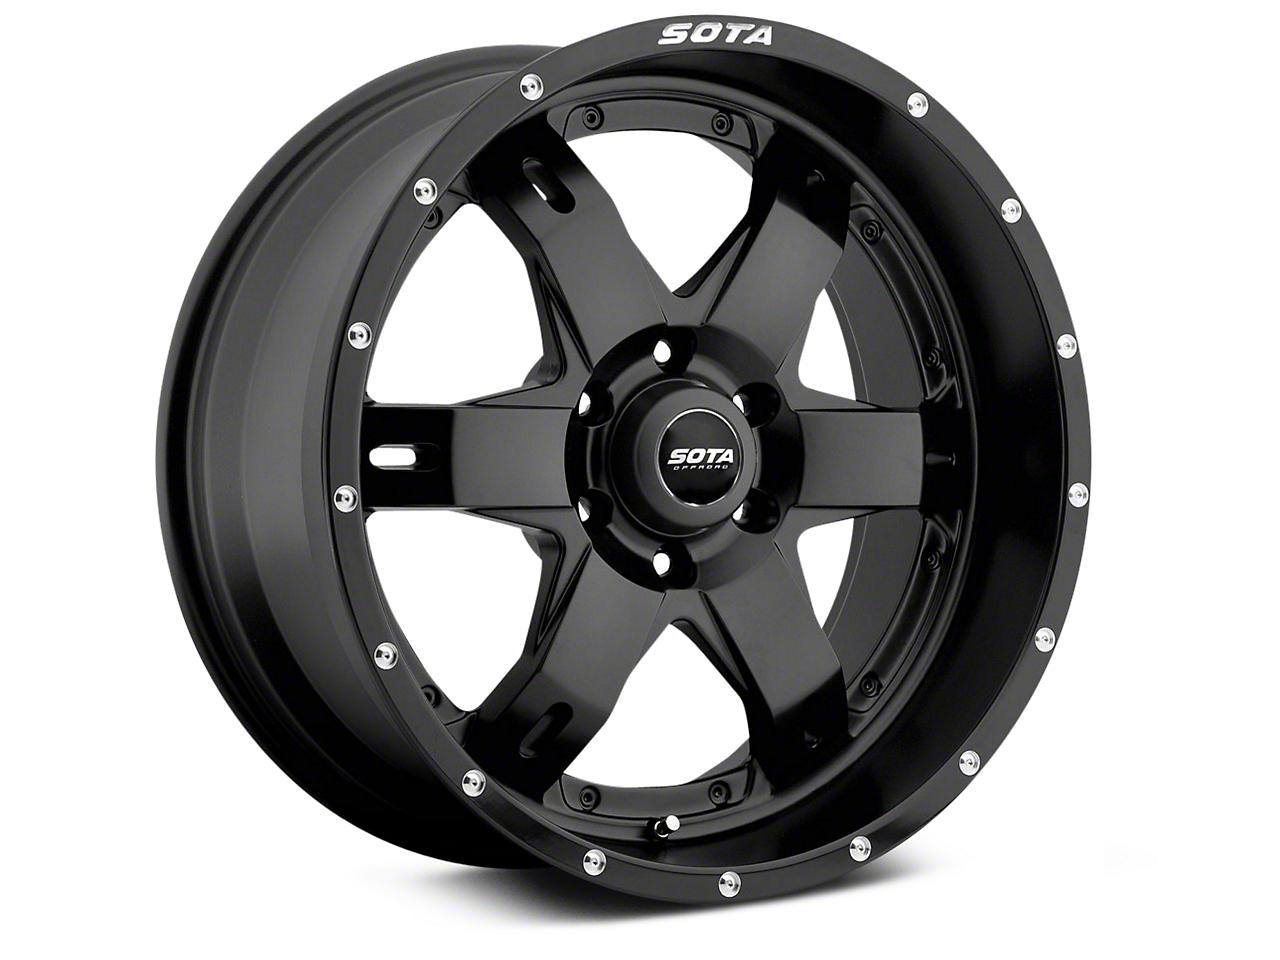 SOTA Off Road REPR Stealth Black 6-Lug Wheel - 20x9 (99-18 Silverado 1500)